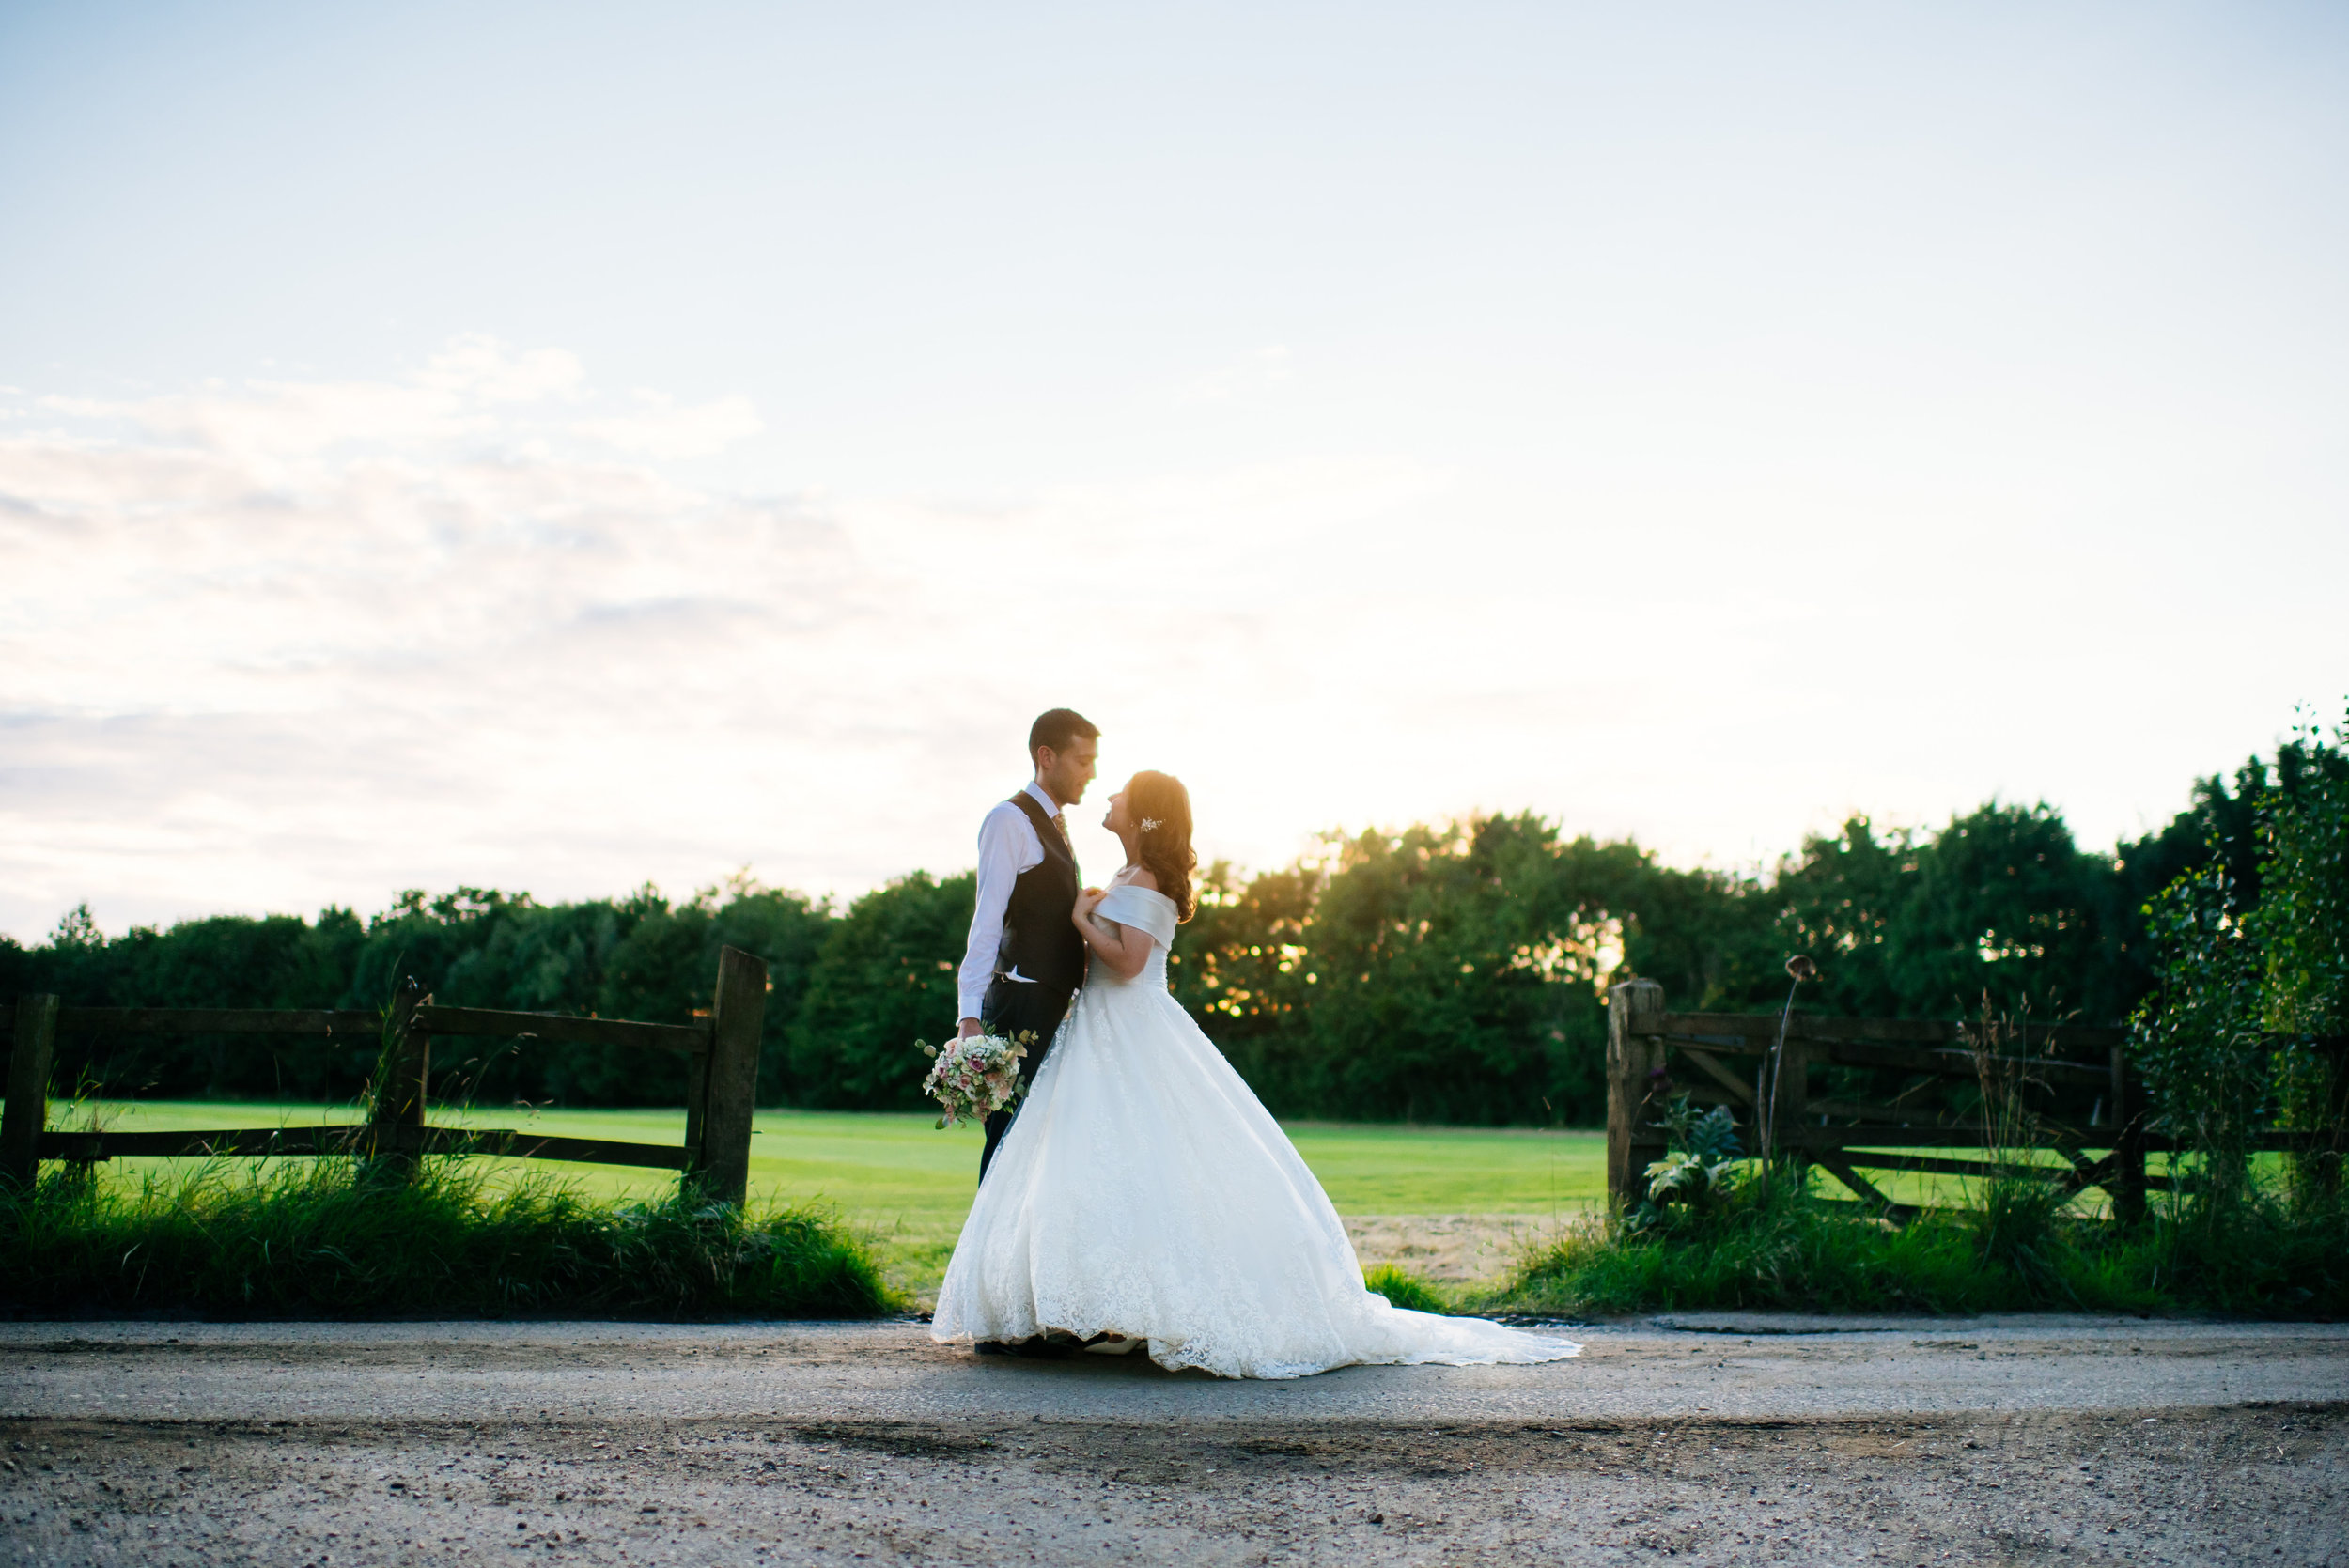 10 Lillibrooke Manor Berkshire Bride Groom Portrait Landscape Wedding Photography.jpg